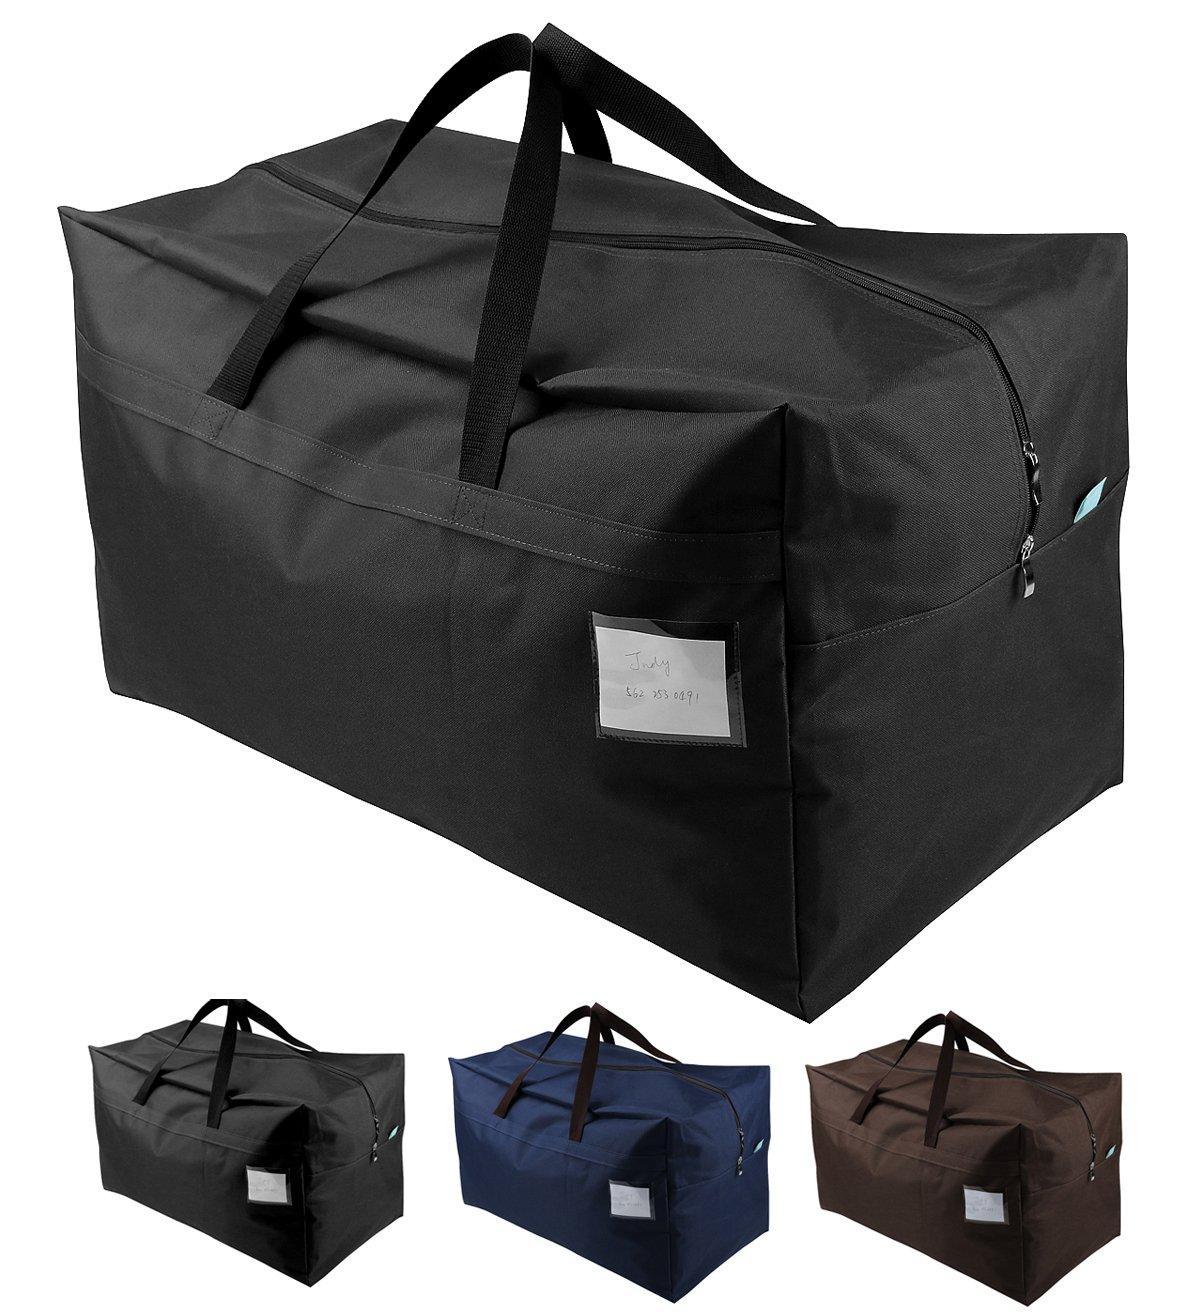 iwill CREATE PRO 100L Waterproof Seasonal Comforters Storage Bags Garage/Attic/Shelves, Black by iwill CREATE PRO